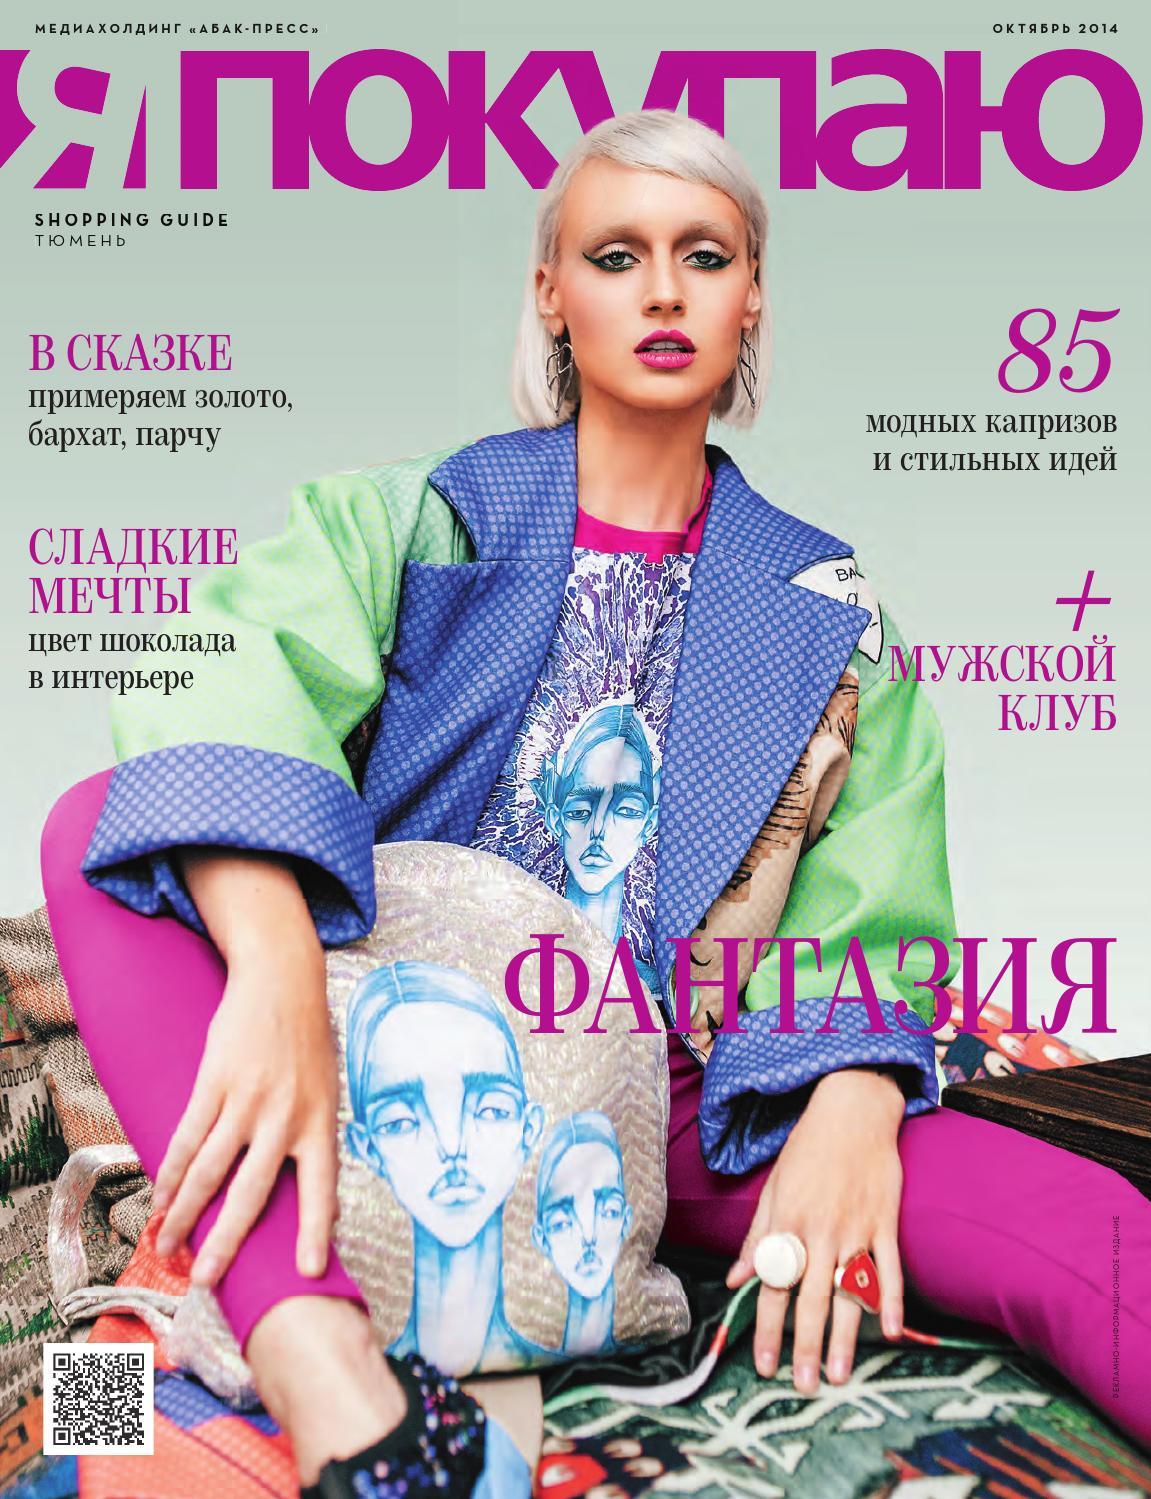 41445d77c231 Я покупаю, Тюмень, октябрь 2014 by Shopping Guide «Я Покупаю» Тюмень - issuu